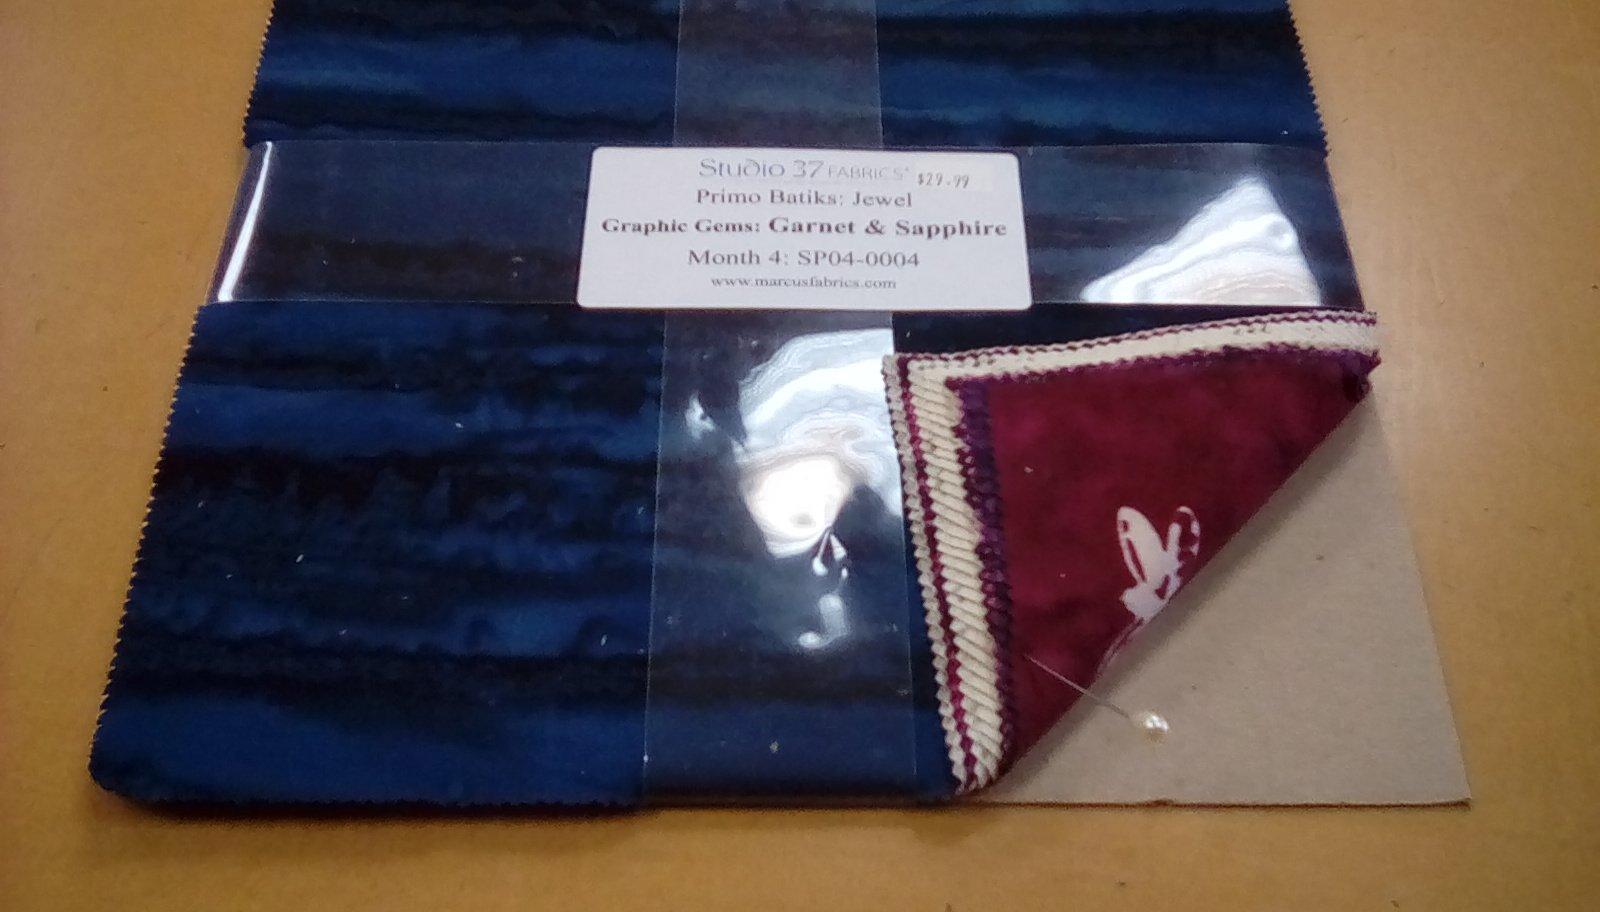 Primo Batiks:Jewel Graphic Gems: Garnet & Sapphire Month 4